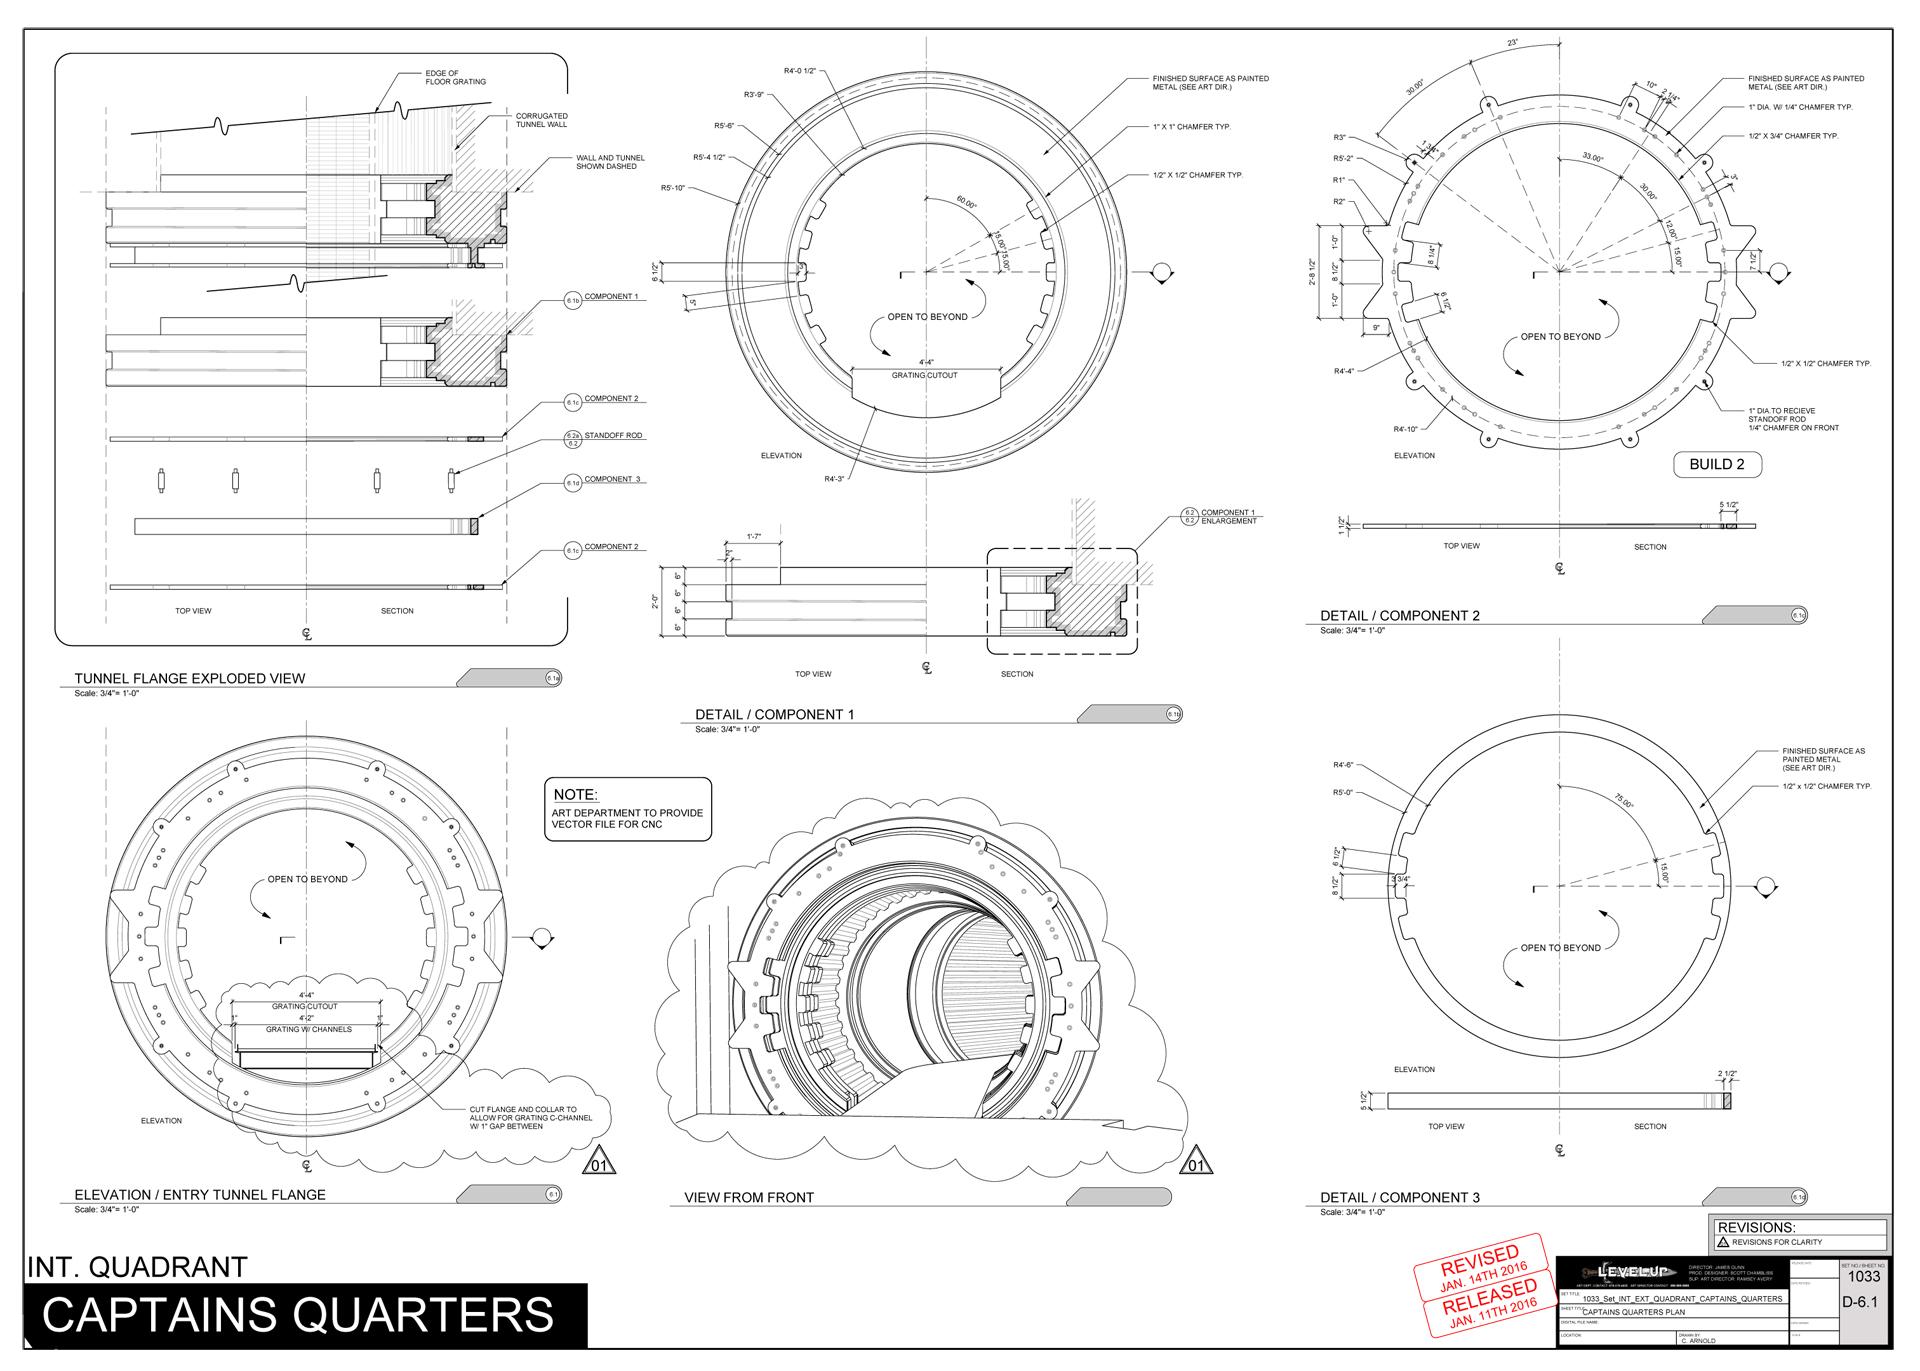 1033_Set_Quadrant_Quarters_INT_D-6-1_160114_TUNNEL_V001_REVISED_CA.jpg